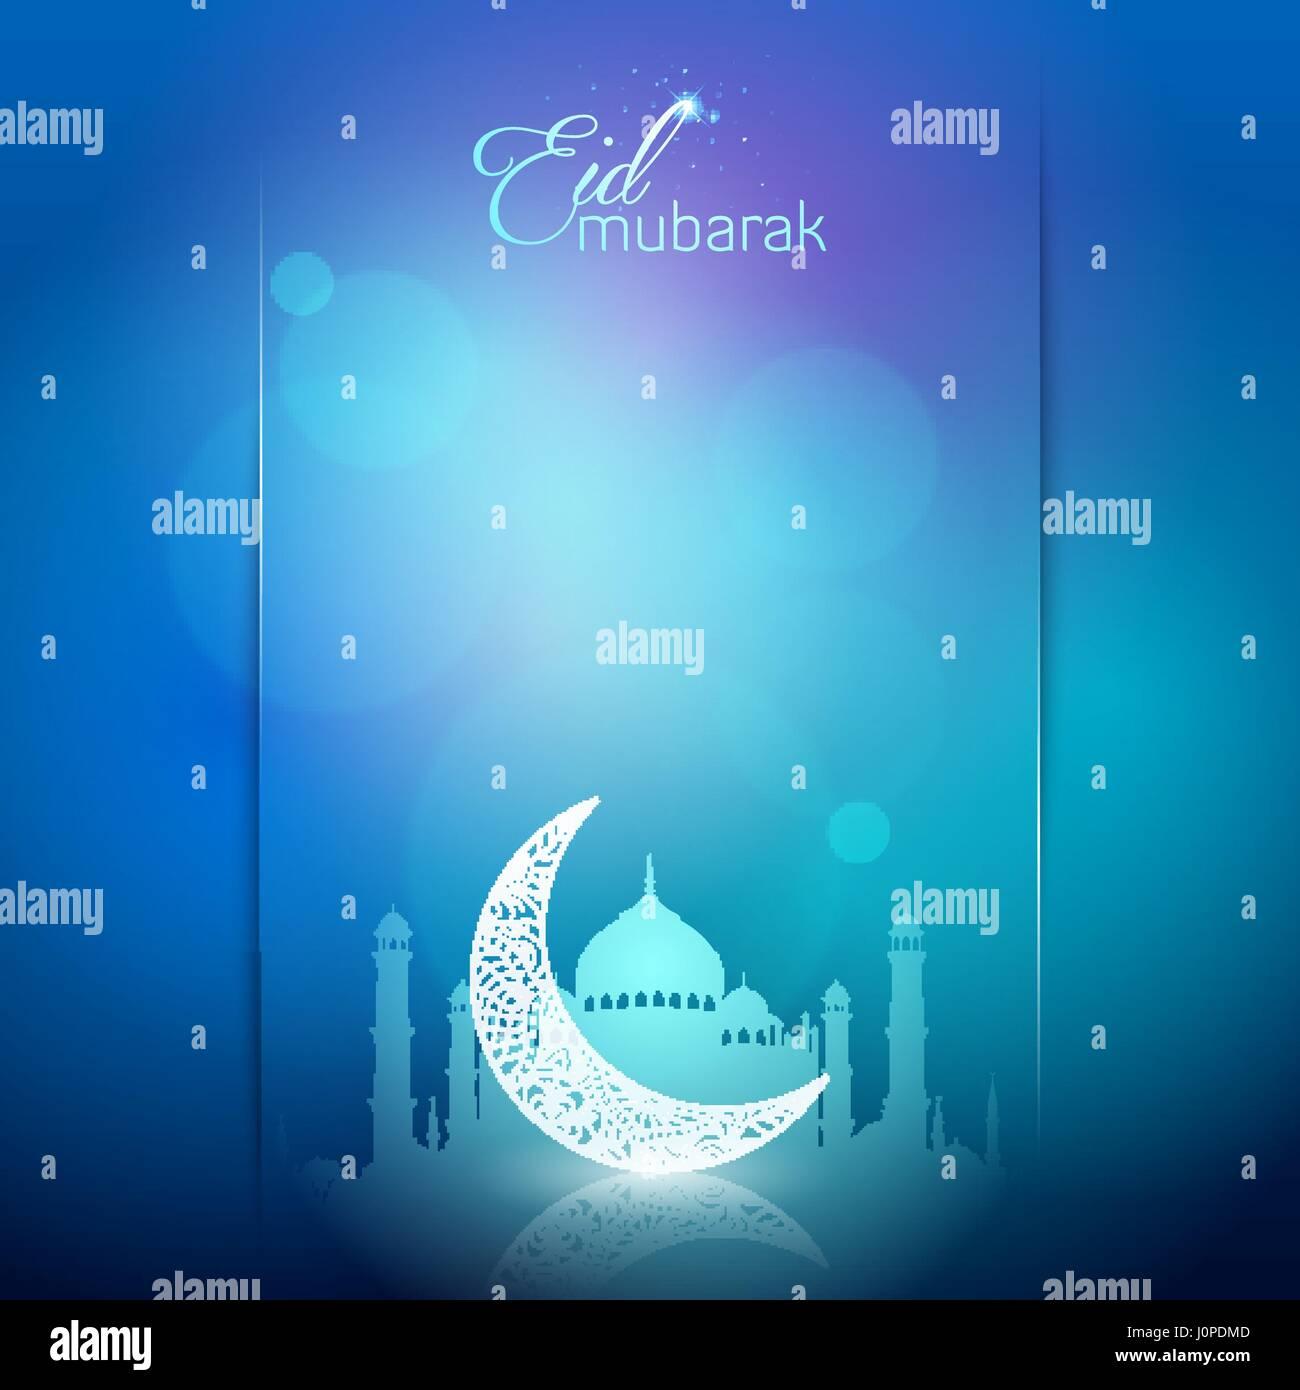 Eid mubarak greeting card background arabic calligraphy with floral eid mubarak greeting card background arabic calligraphy with floral crescent kristyandbryce Choice Image